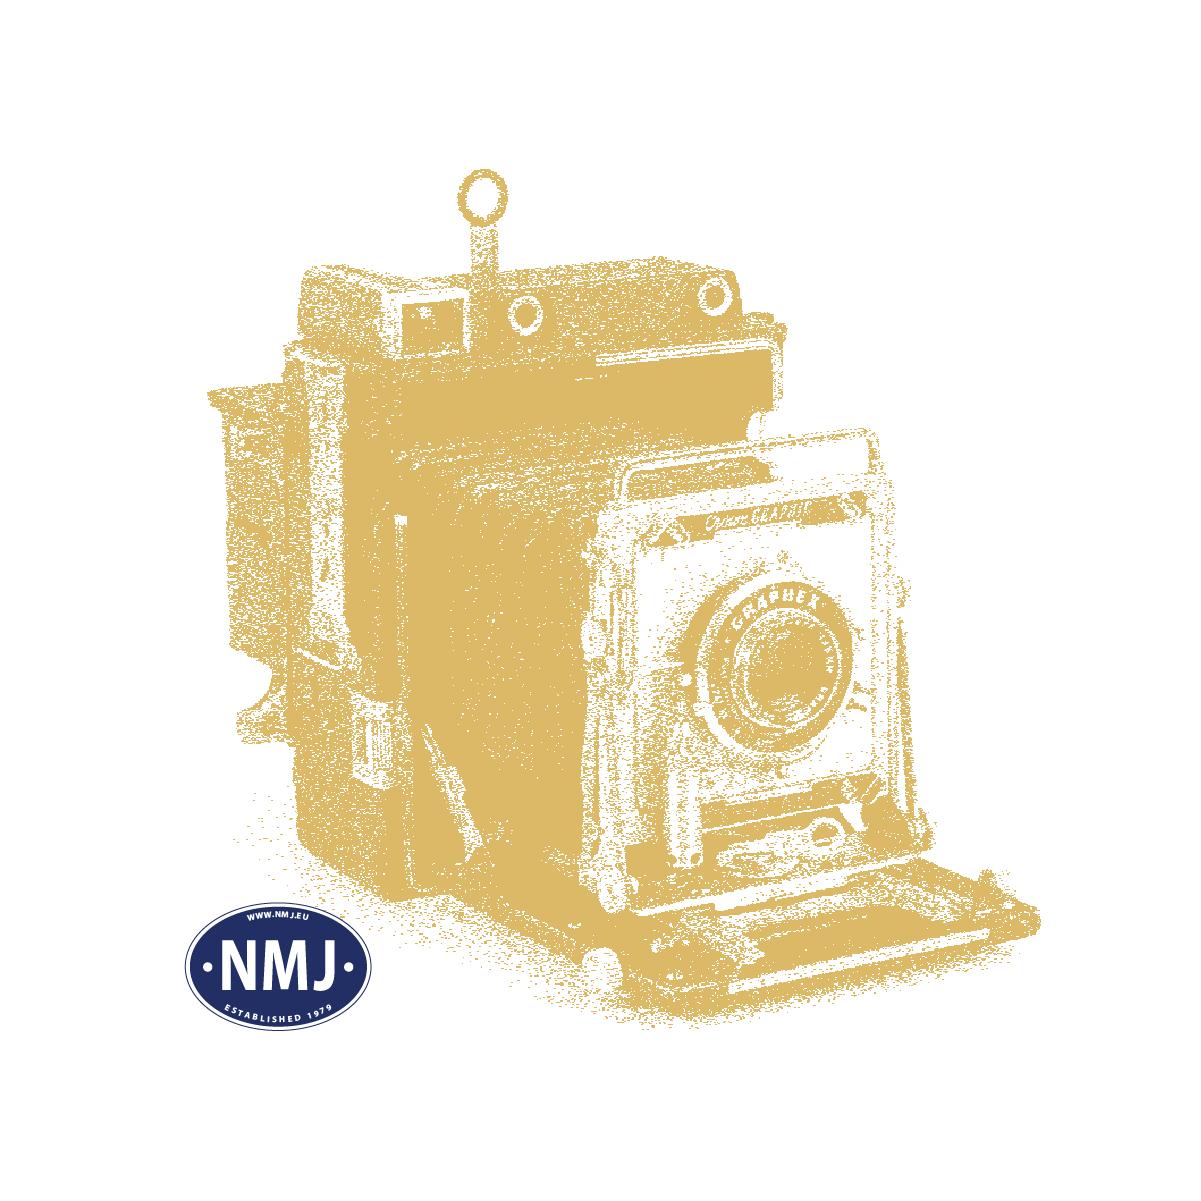 NMJT245301 - NMJ Topline CFL 1602, 0-Scale, DCC Sound, 1:45